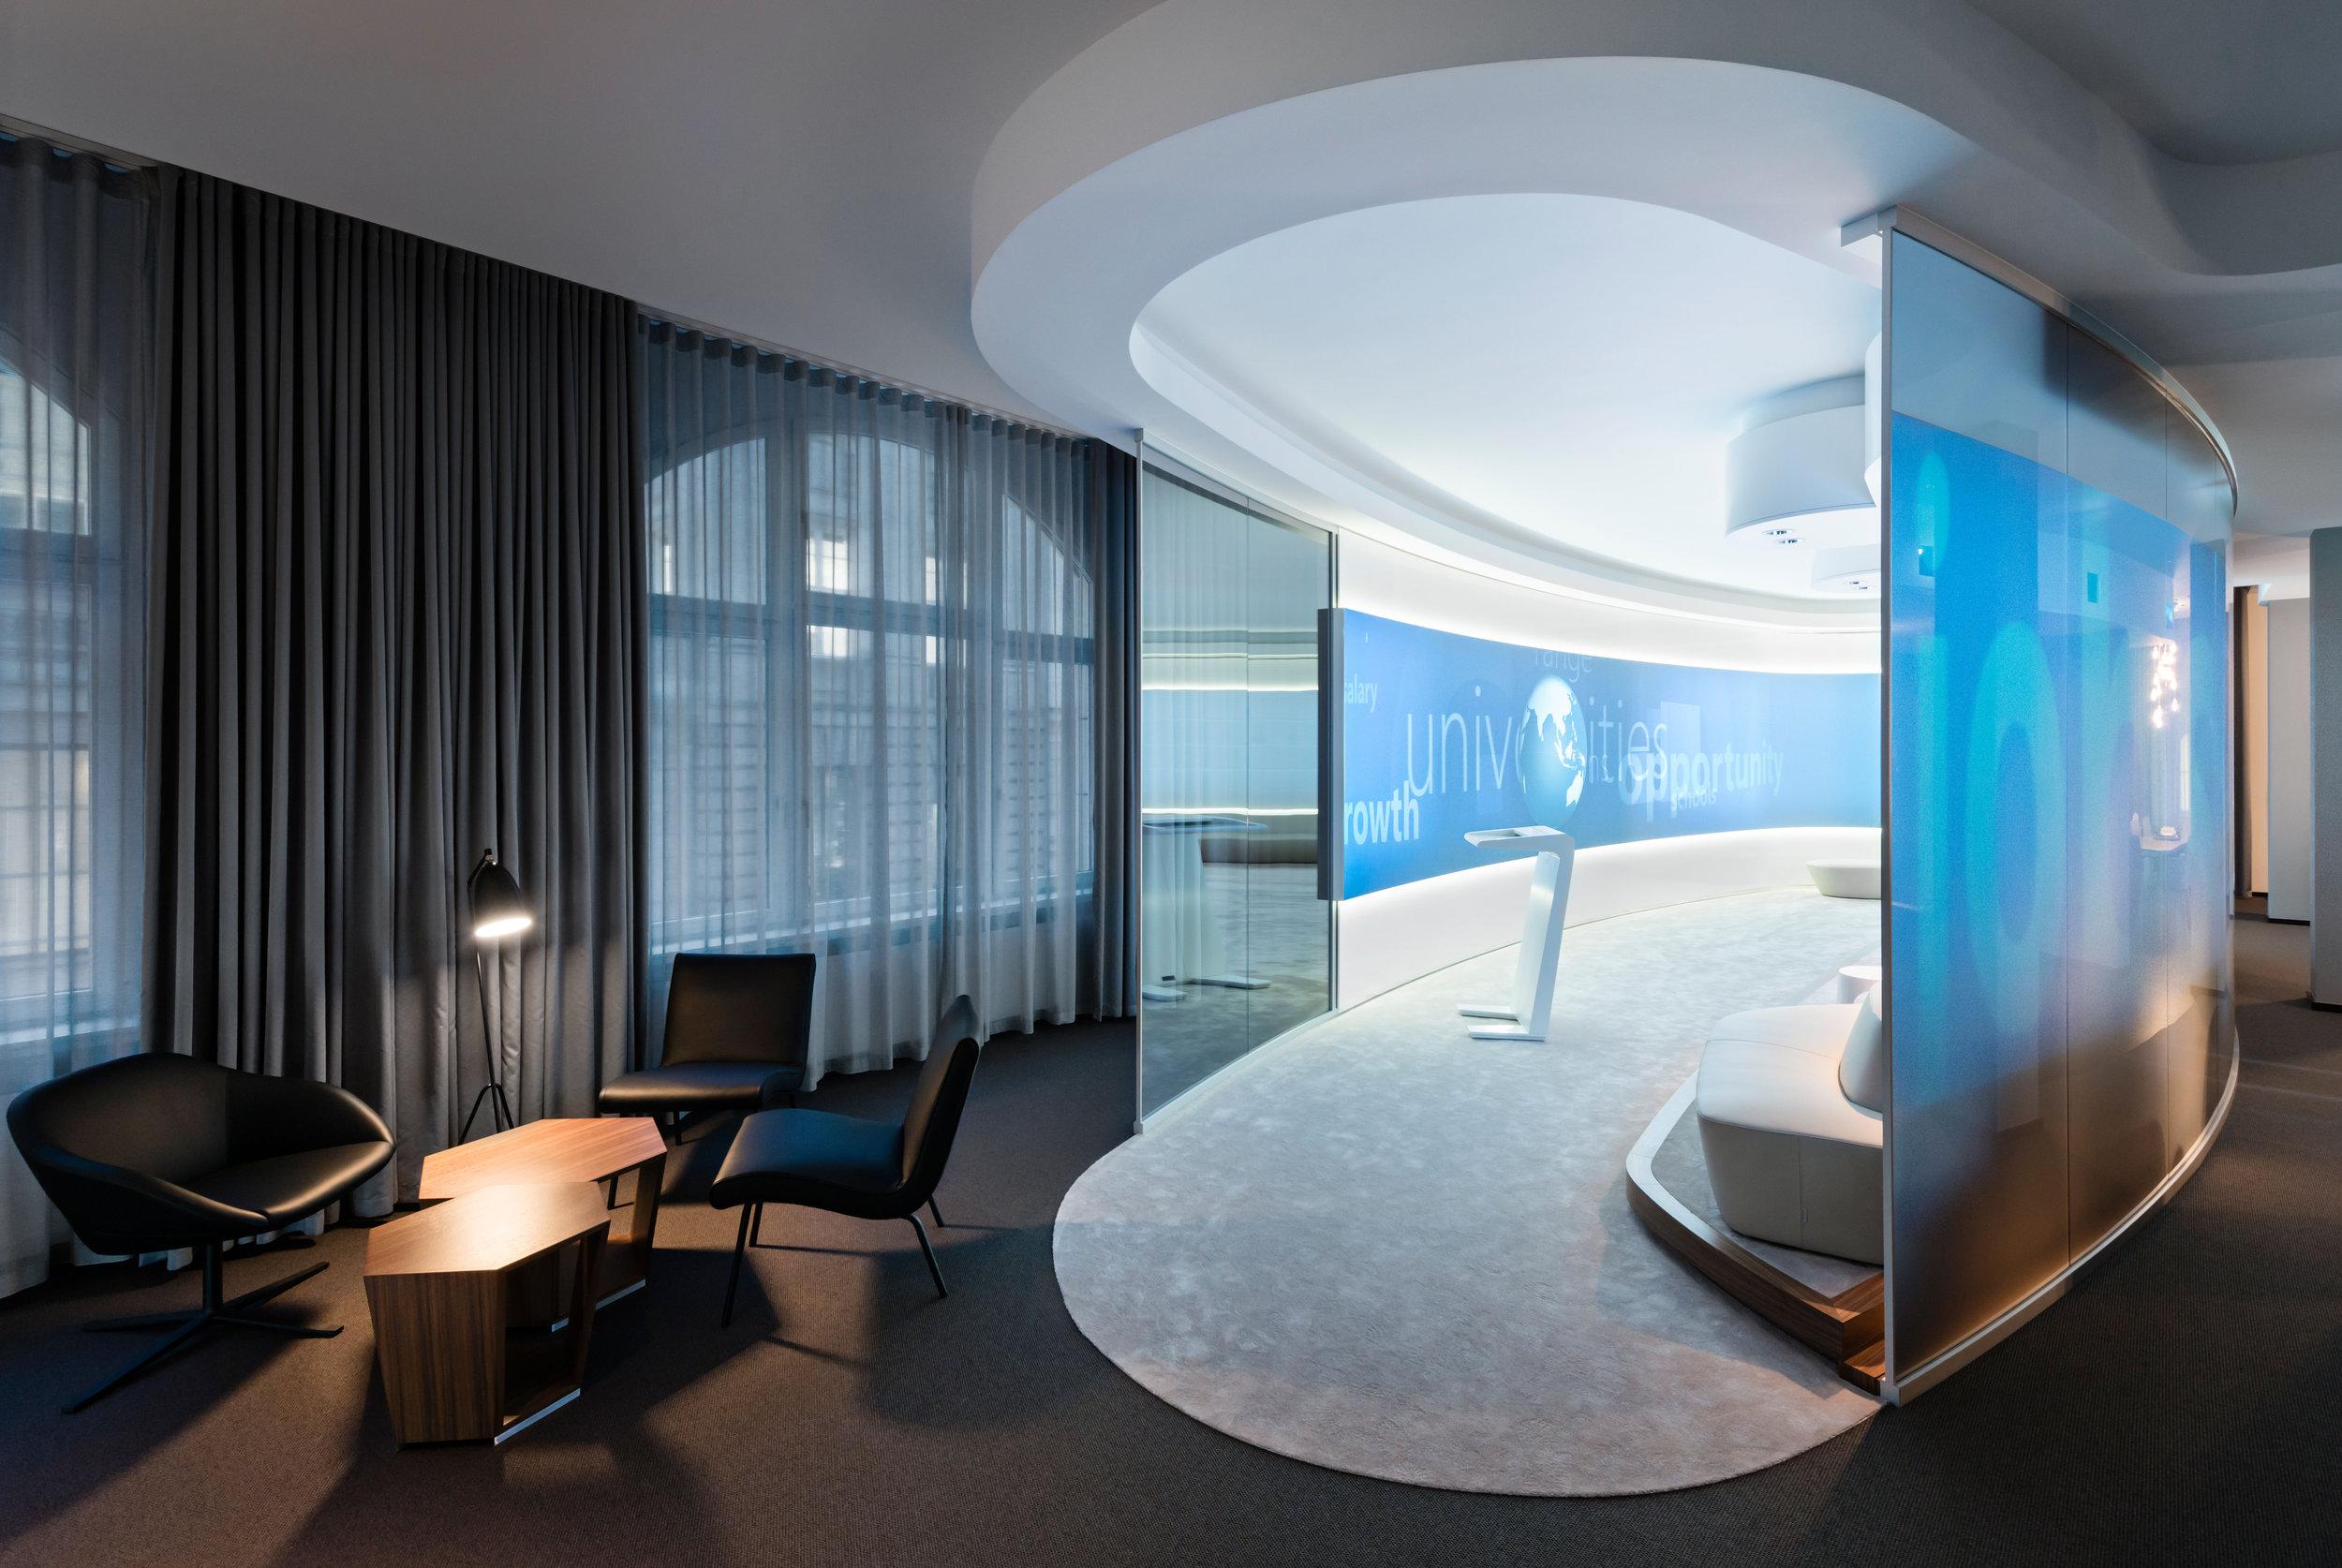 microsoft-center_coorporate-interior-design_coordination-berlin_13.jpg